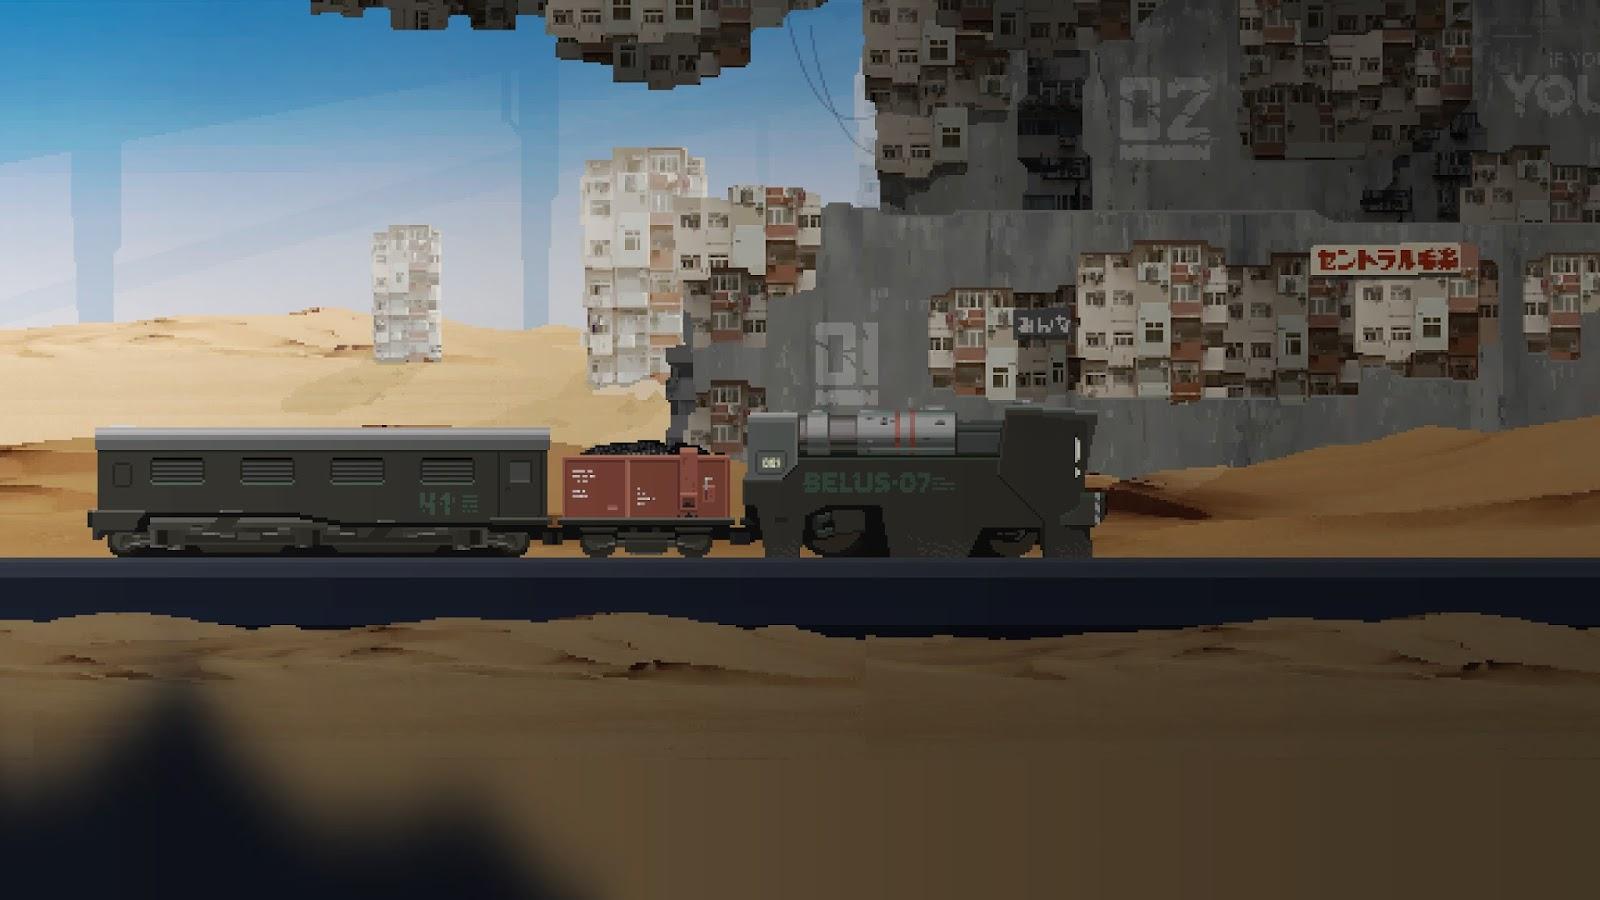 tinyBuild, The Final Station, PC, Steam, PS4, Xbox One, постапокалипсис, приключение, сурвайвл, зомби, симулятор машиниста, хоррор, horror